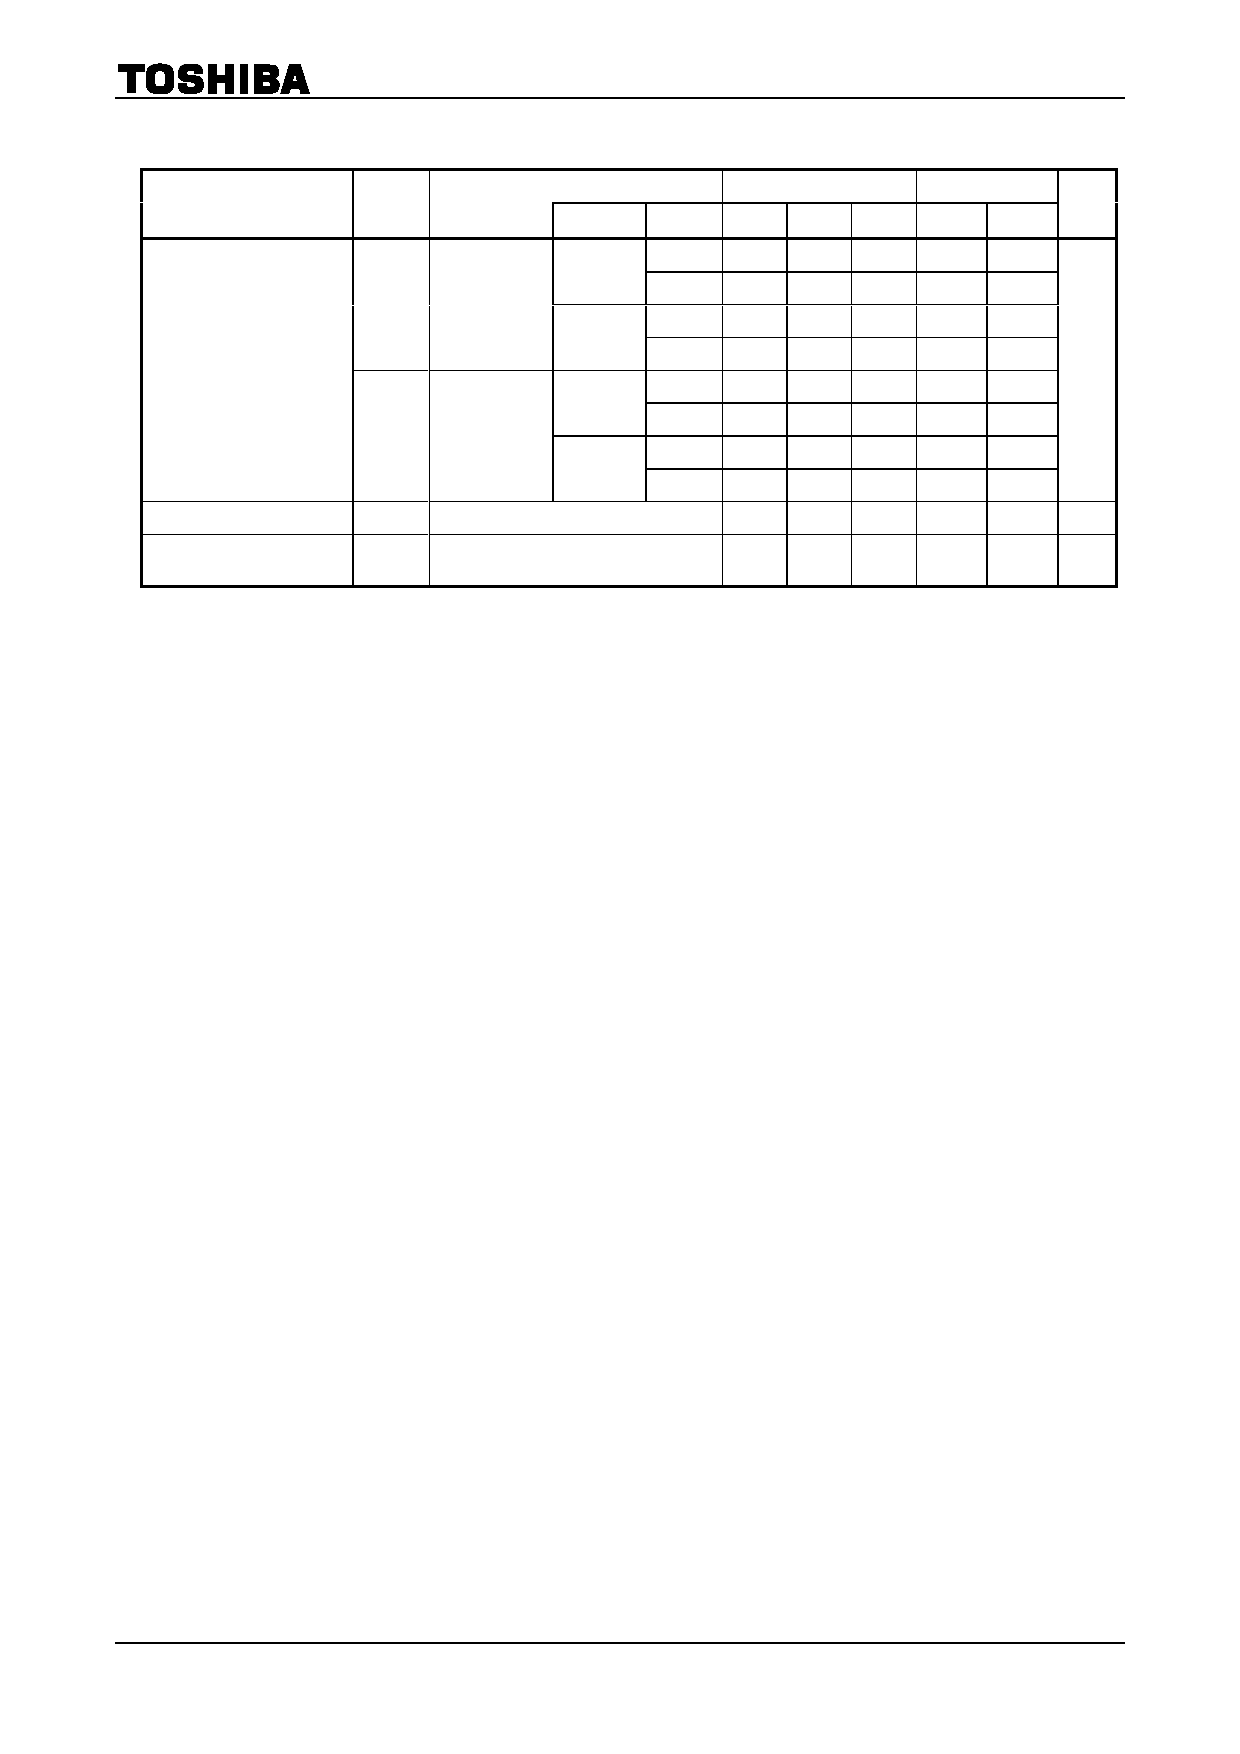 TC7SH09F pdf, 반도체, 판매, 대치품